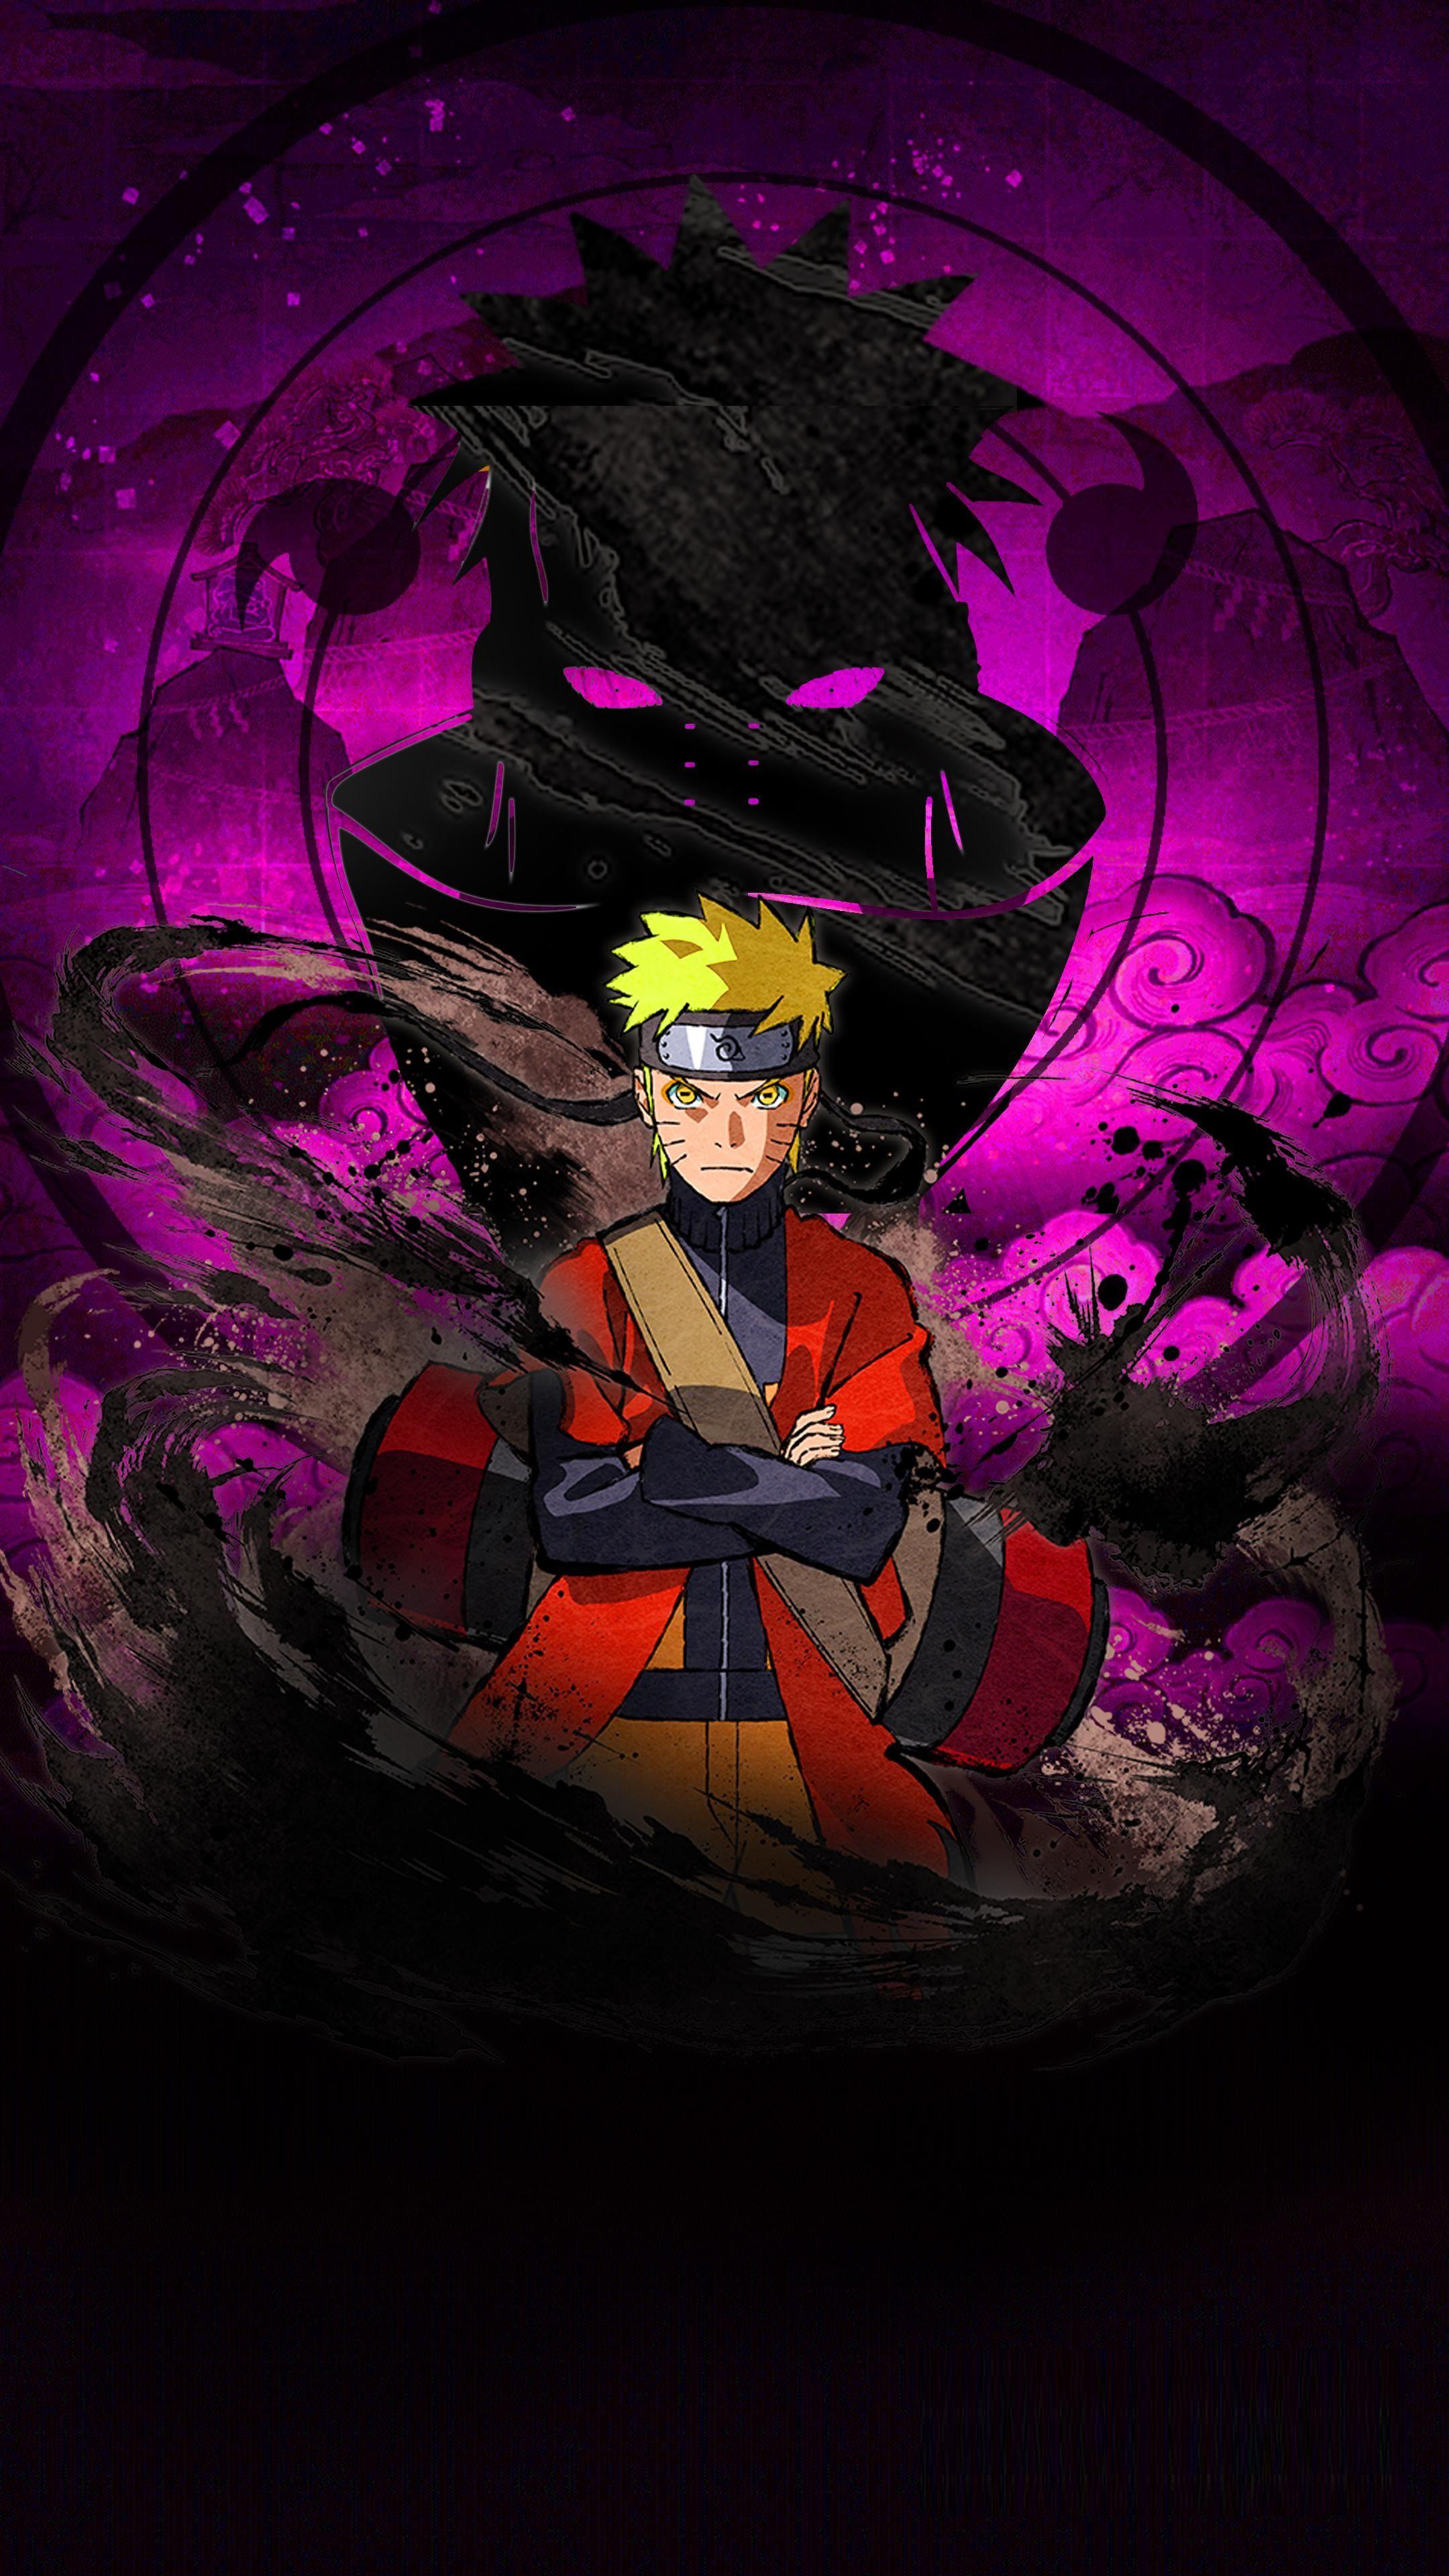 Naruto Wallpaper HD - EnWallpaper